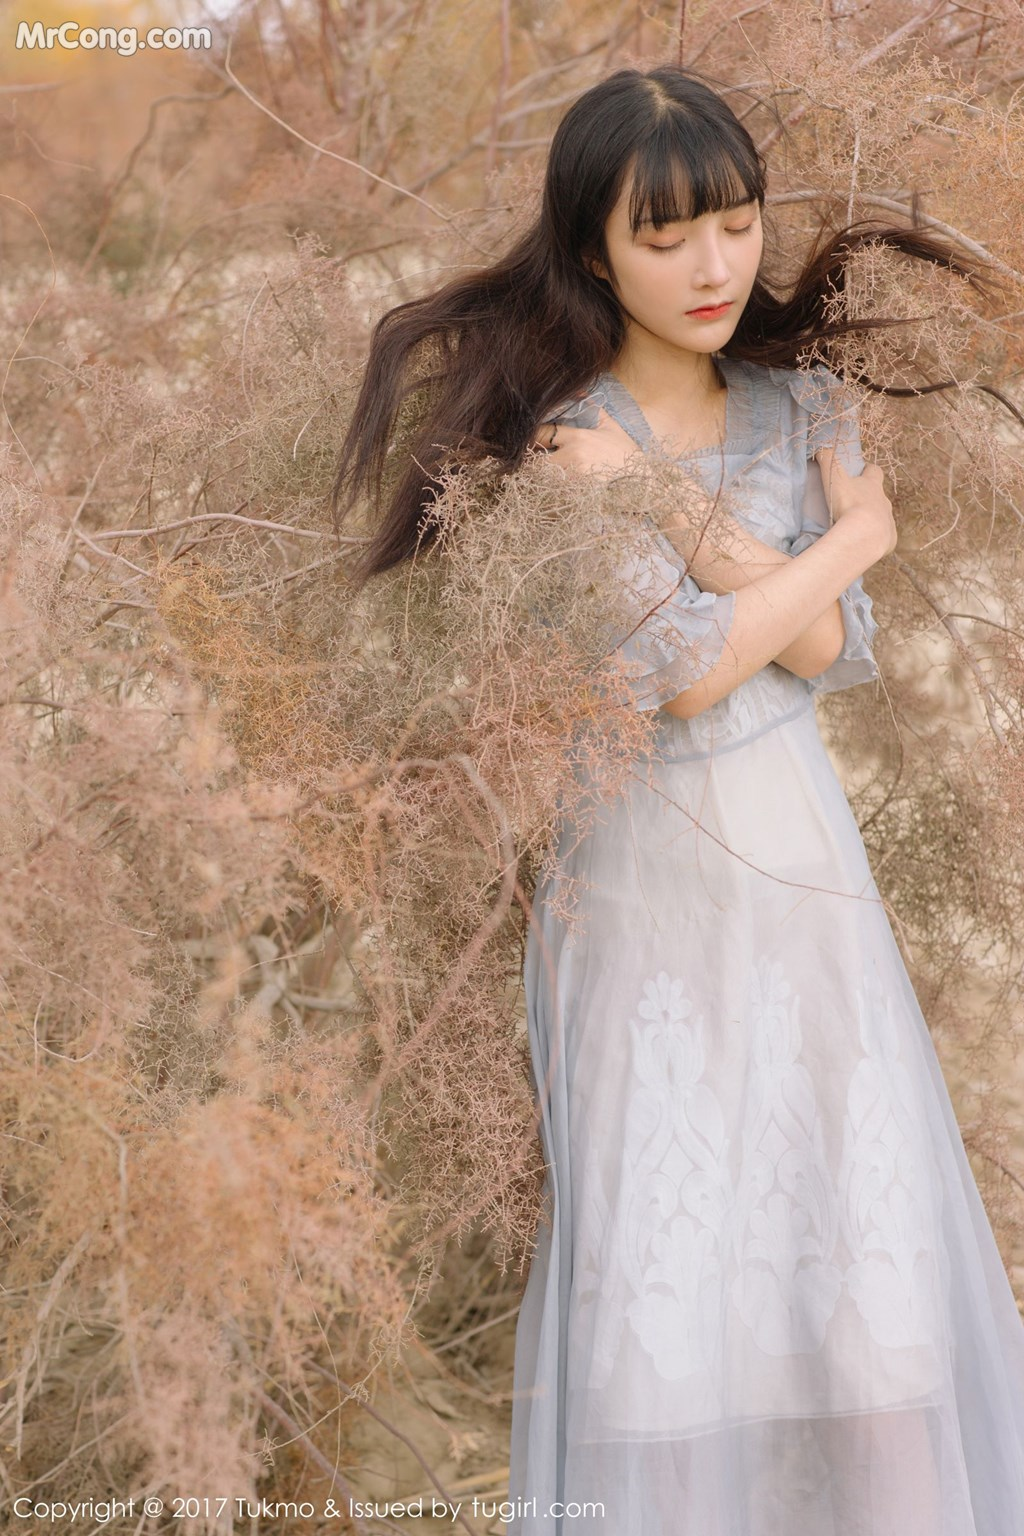 Image Tukmo-Vol.104-Zhi-Ying-MrCong.com-005 in post Tukmo Vol.104: Người mẫu Zhi Ying (之应) (41 ảnh)